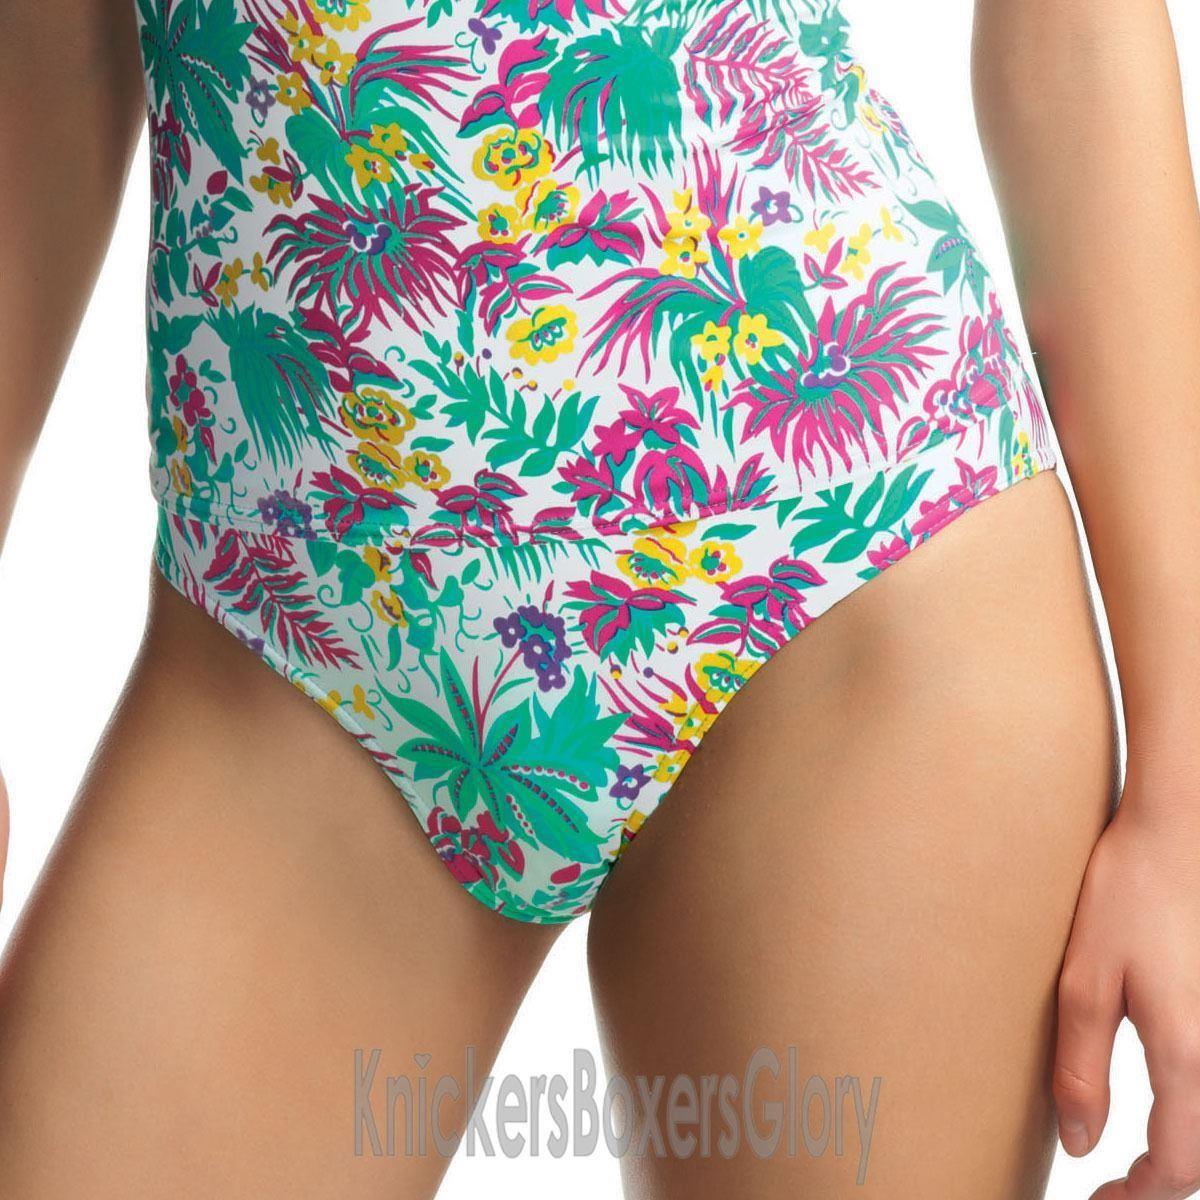 Freya Girl Friday Classic Bikini Brief - Jade